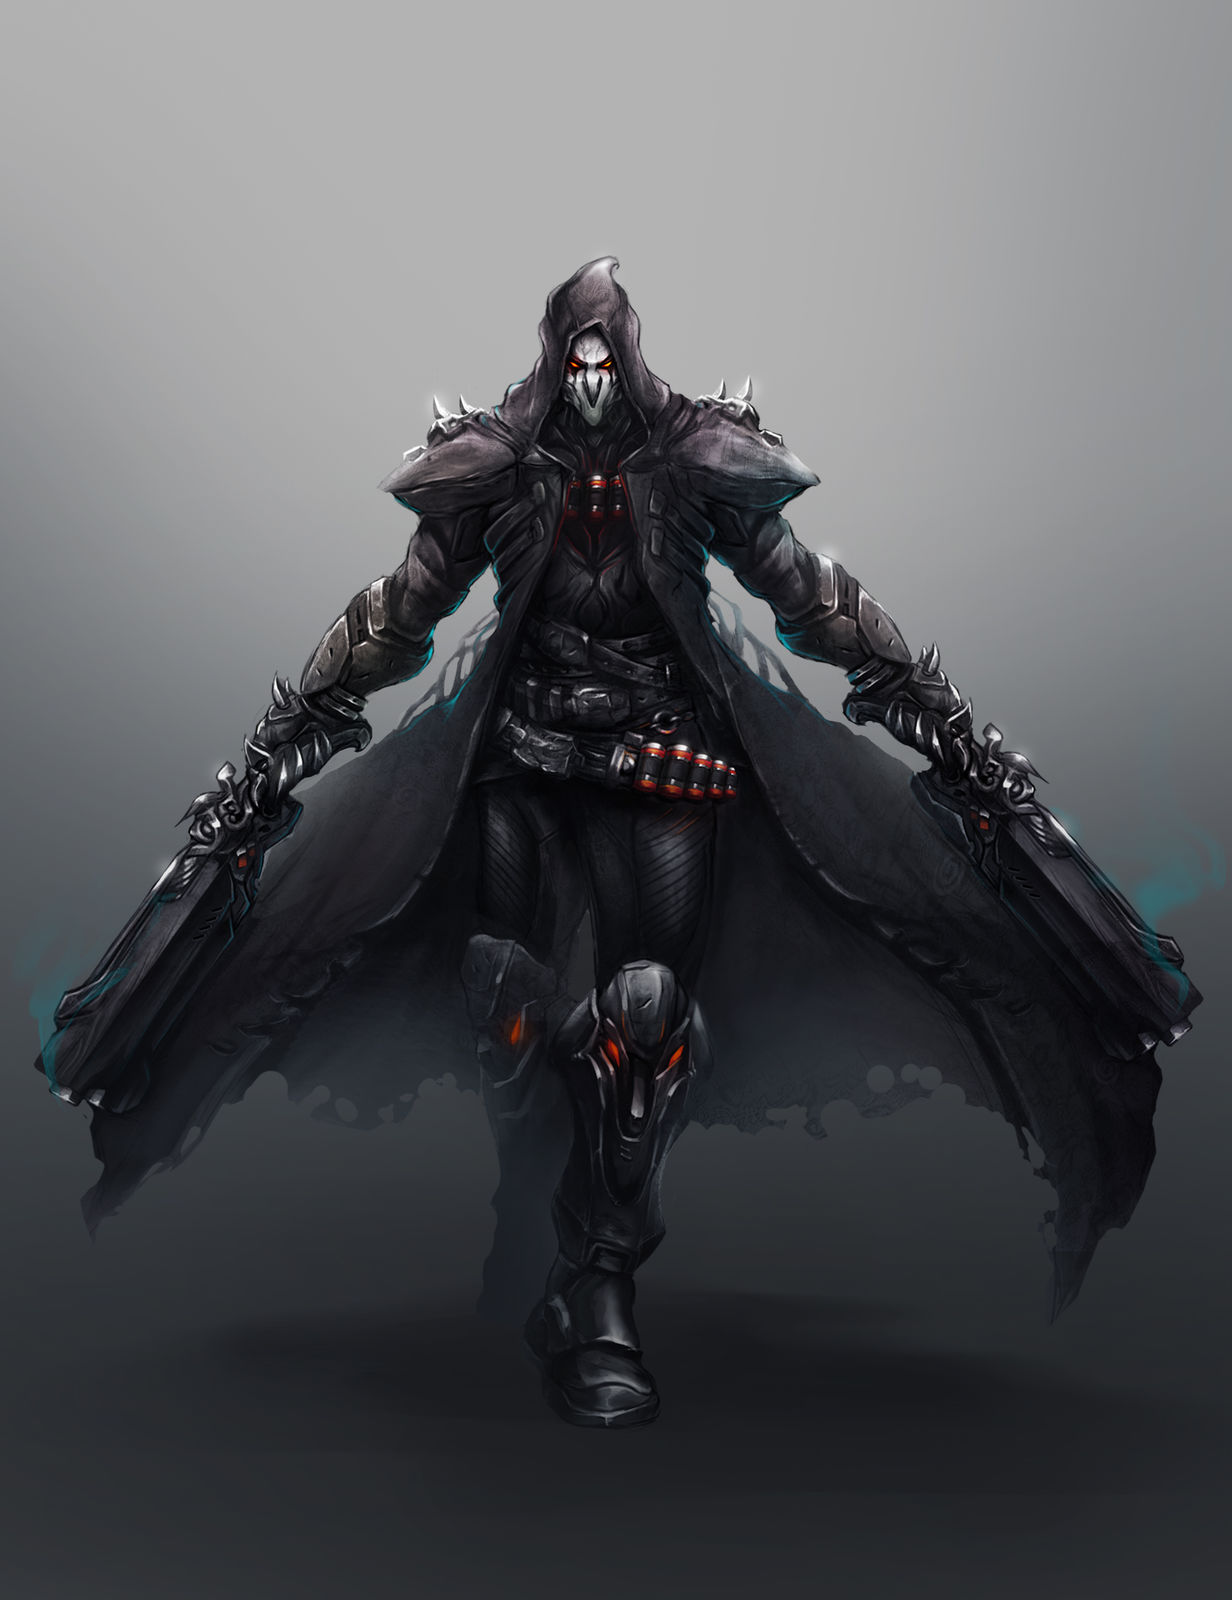 Jhin, the Relentless Mercenary Xi2oVk